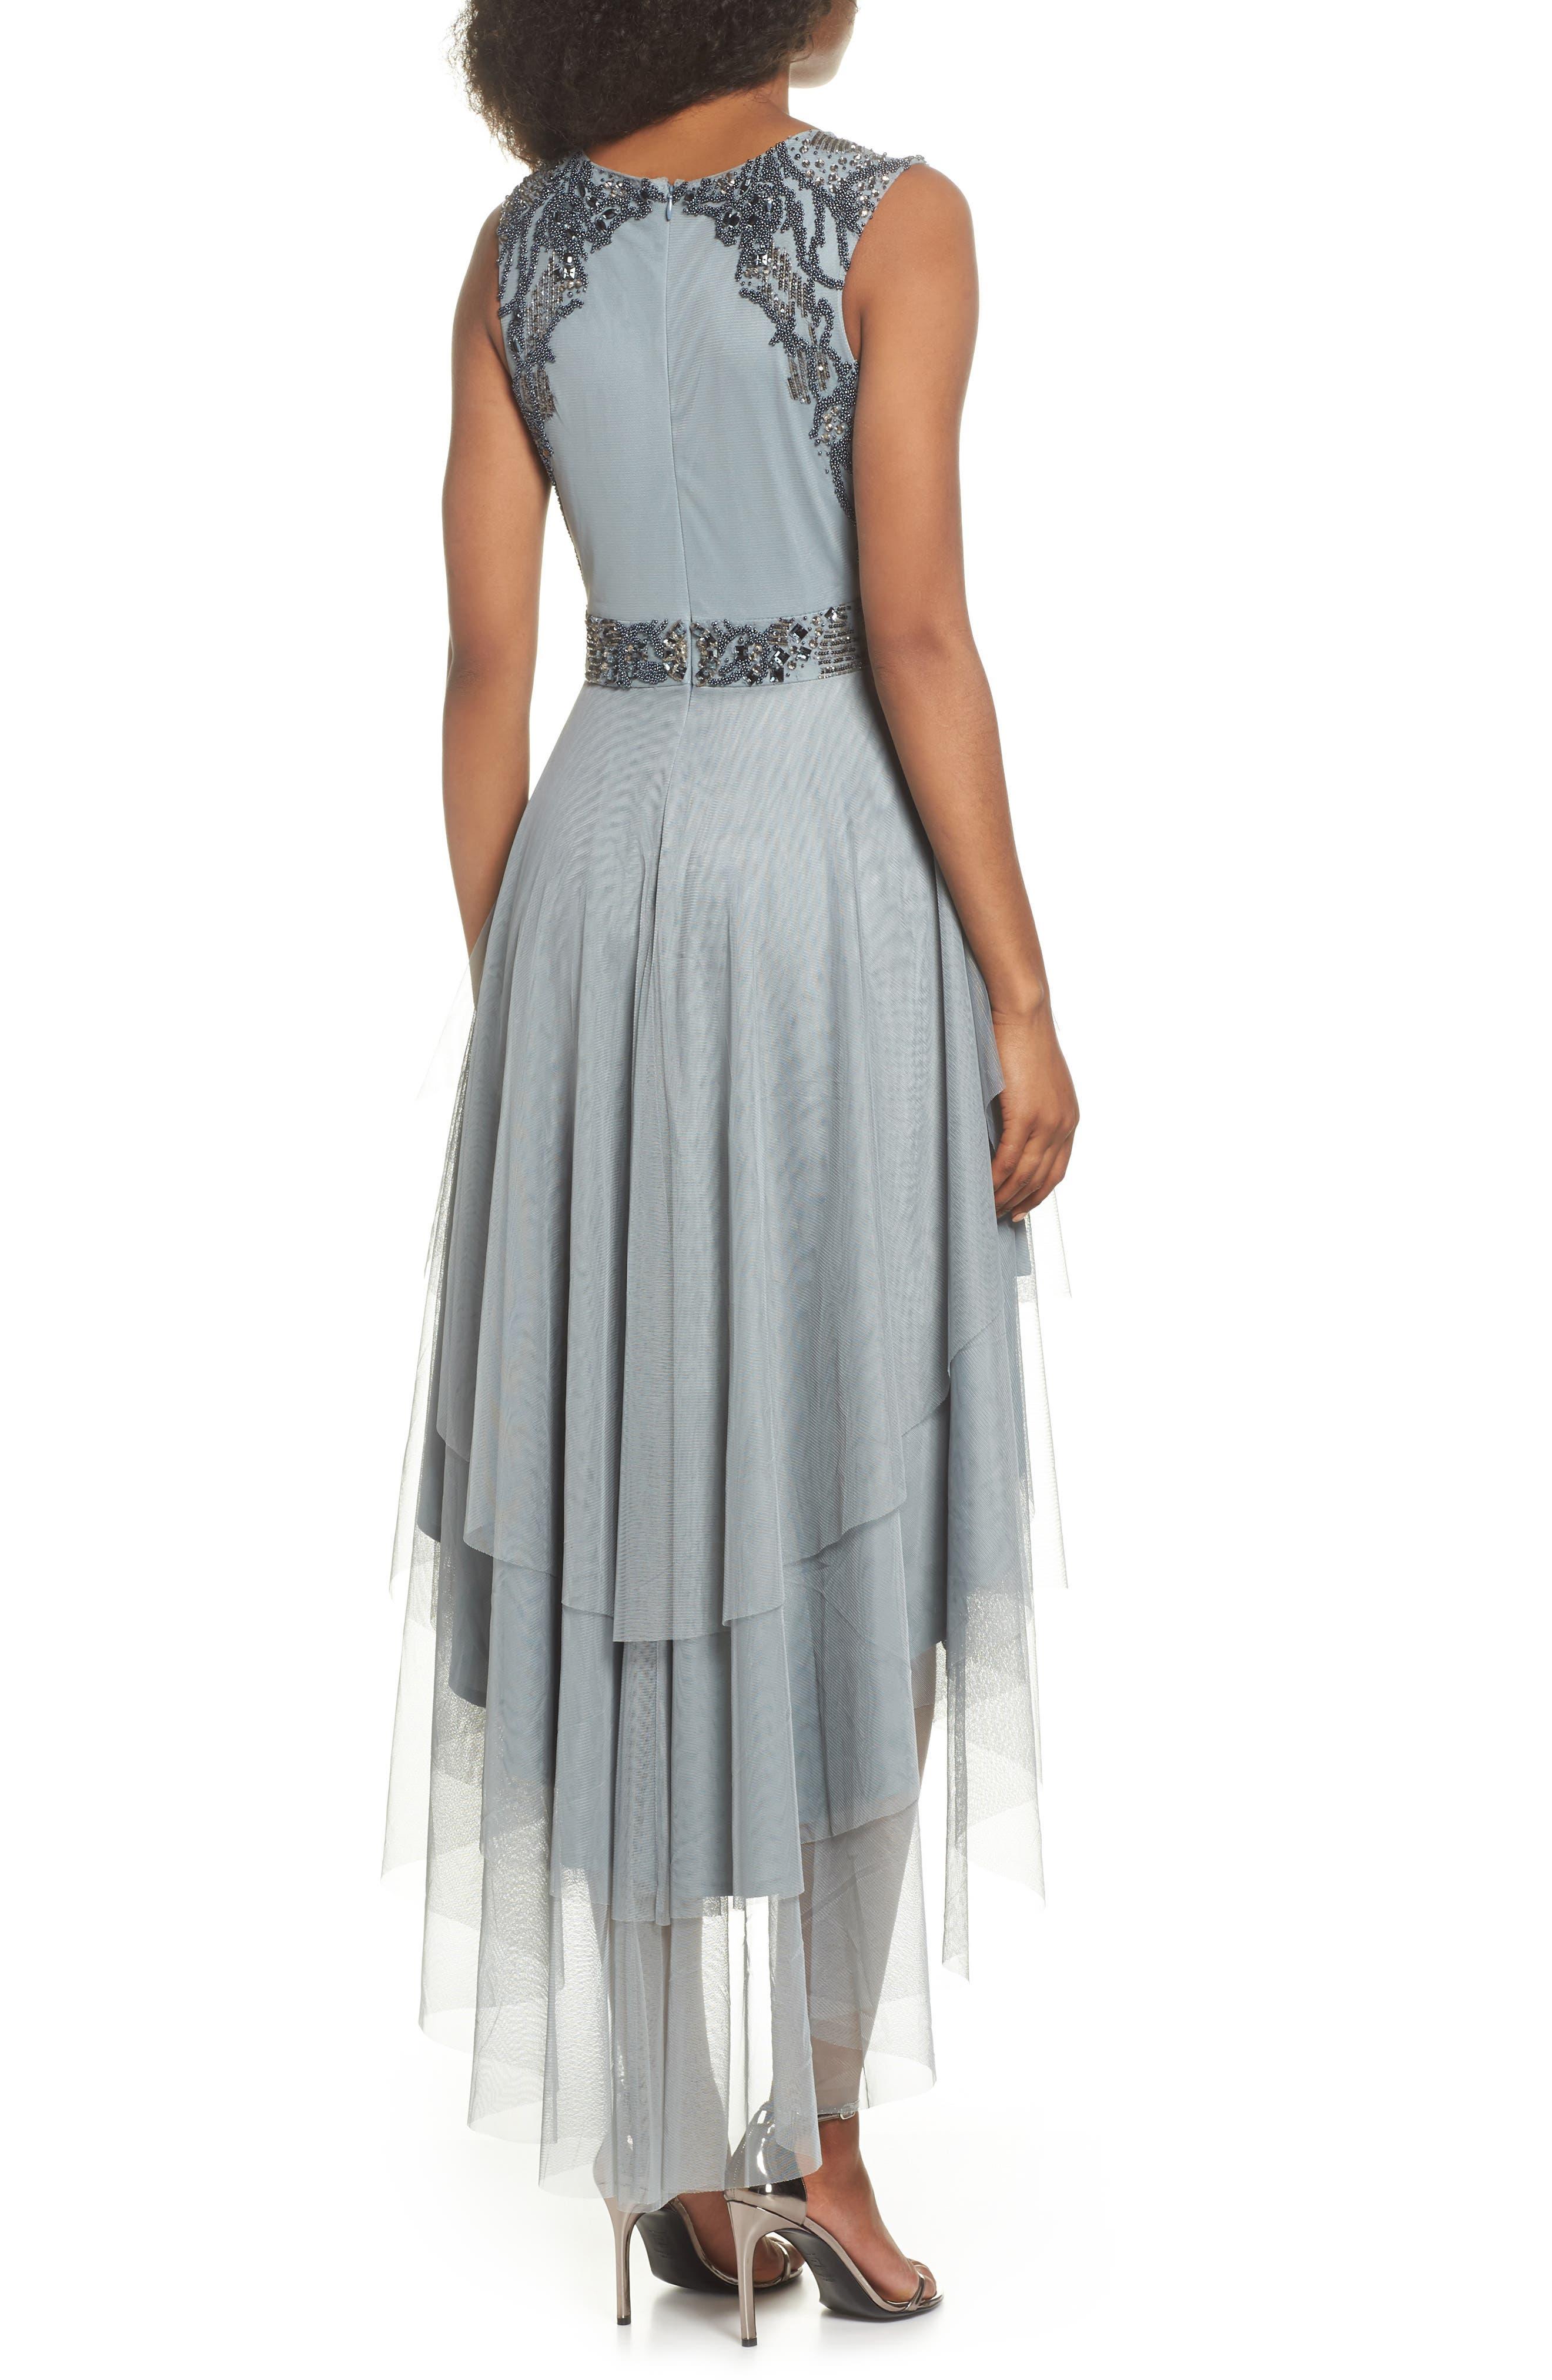 Bridget Embellished Tiered Tulle Dress,                             Alternate thumbnail 2, color,                             GREY